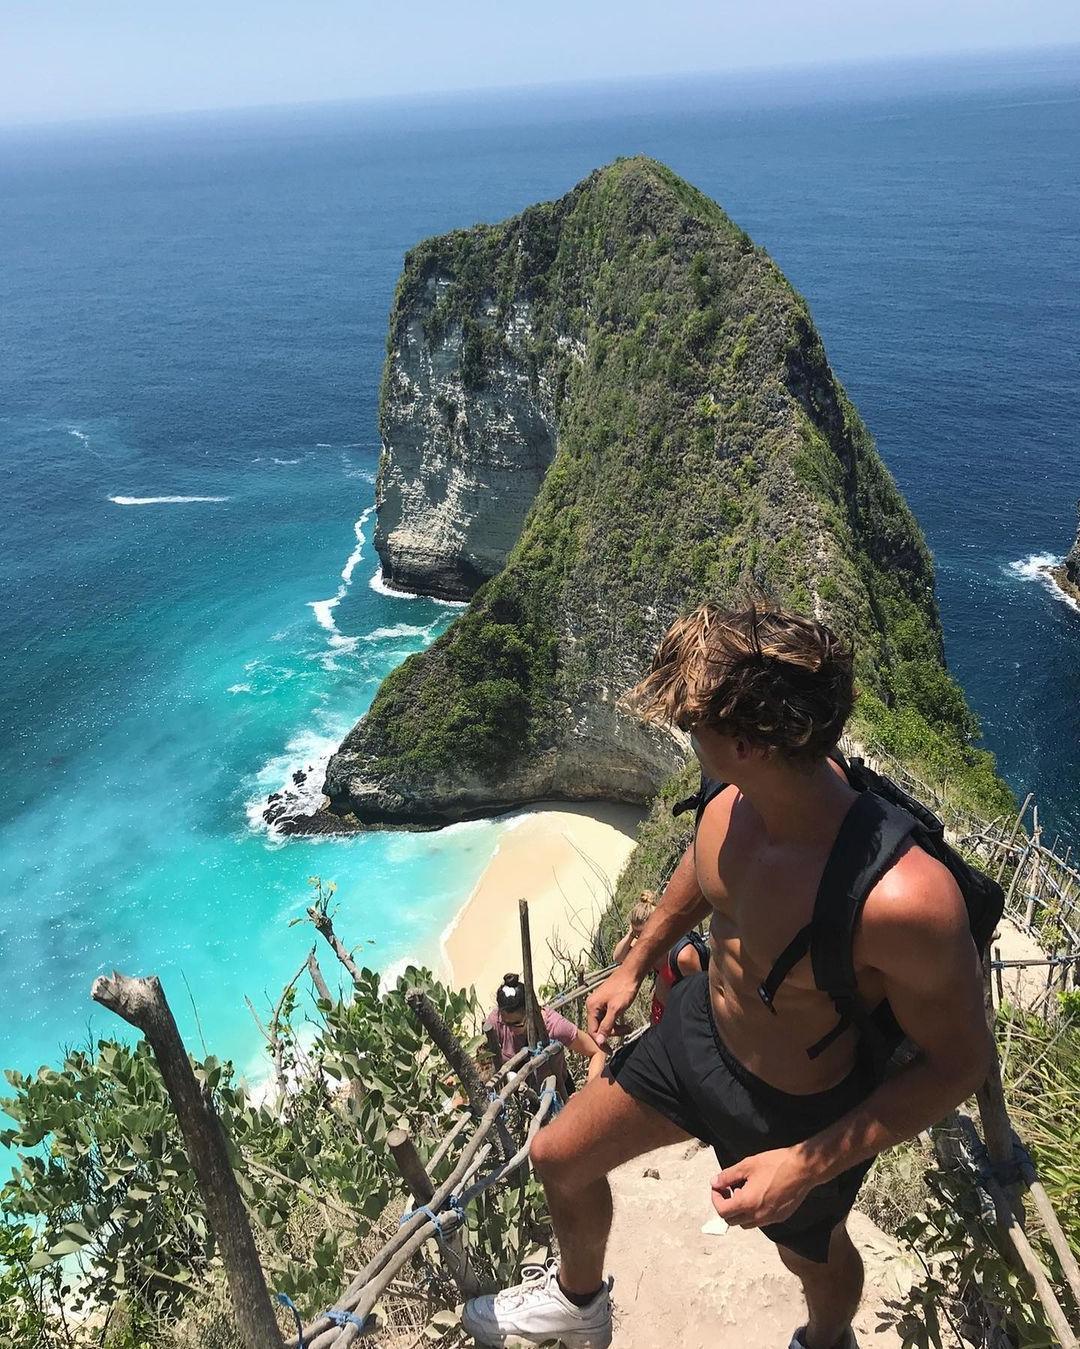 beach-adventure-amazing-world-photos-thom-strijd-killer-view-ocean